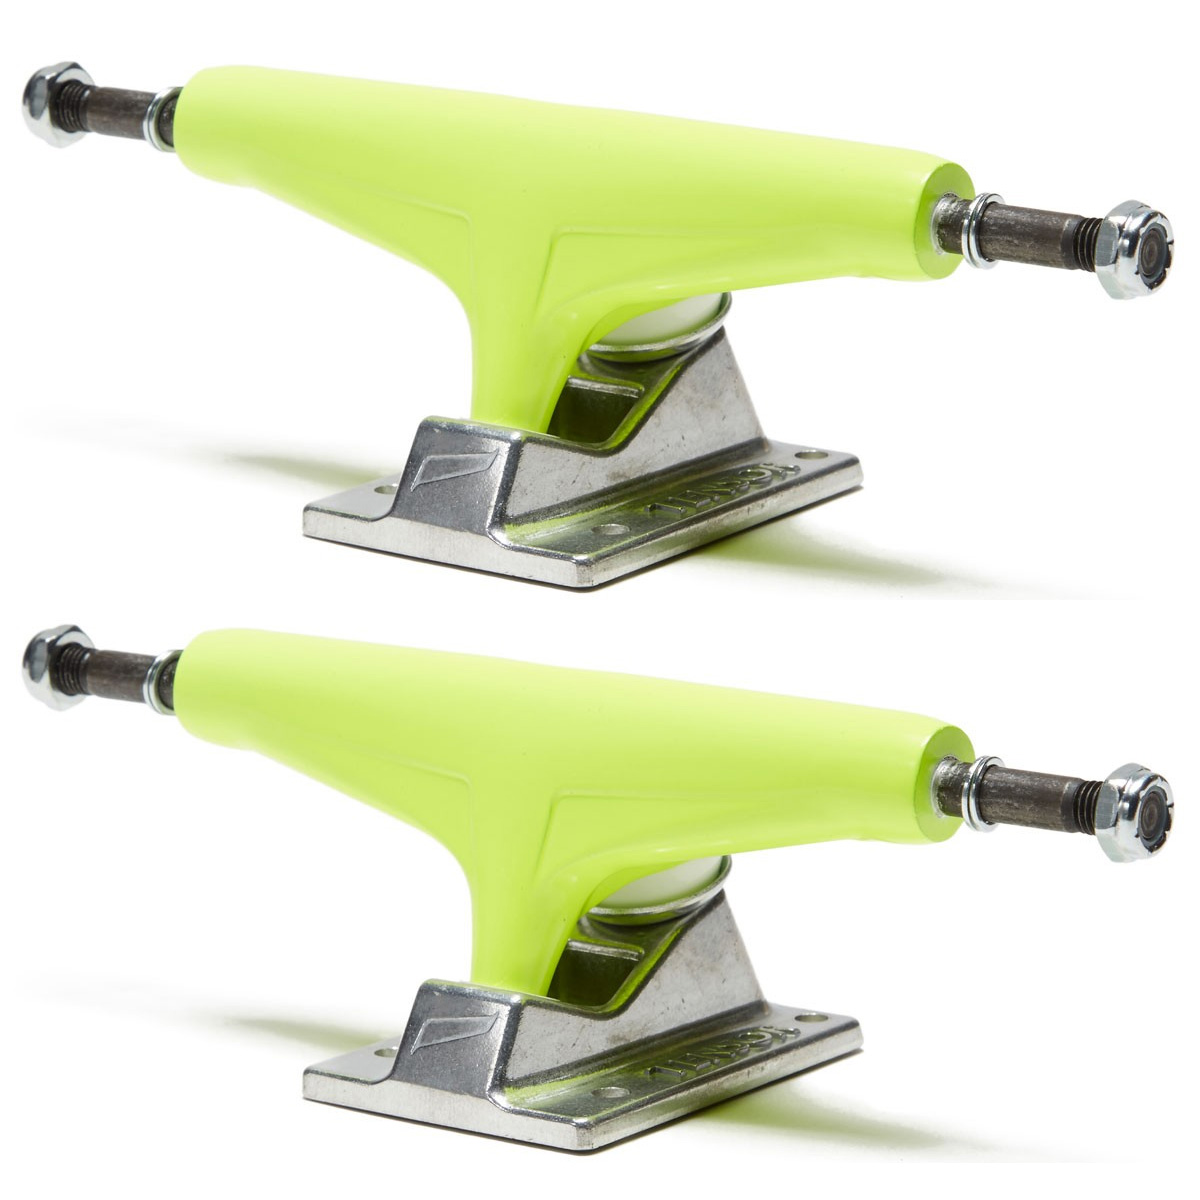 Tensor Skateboard Trucks 5.25 Aluminum Neon Yellow/Raw 8.0 ...